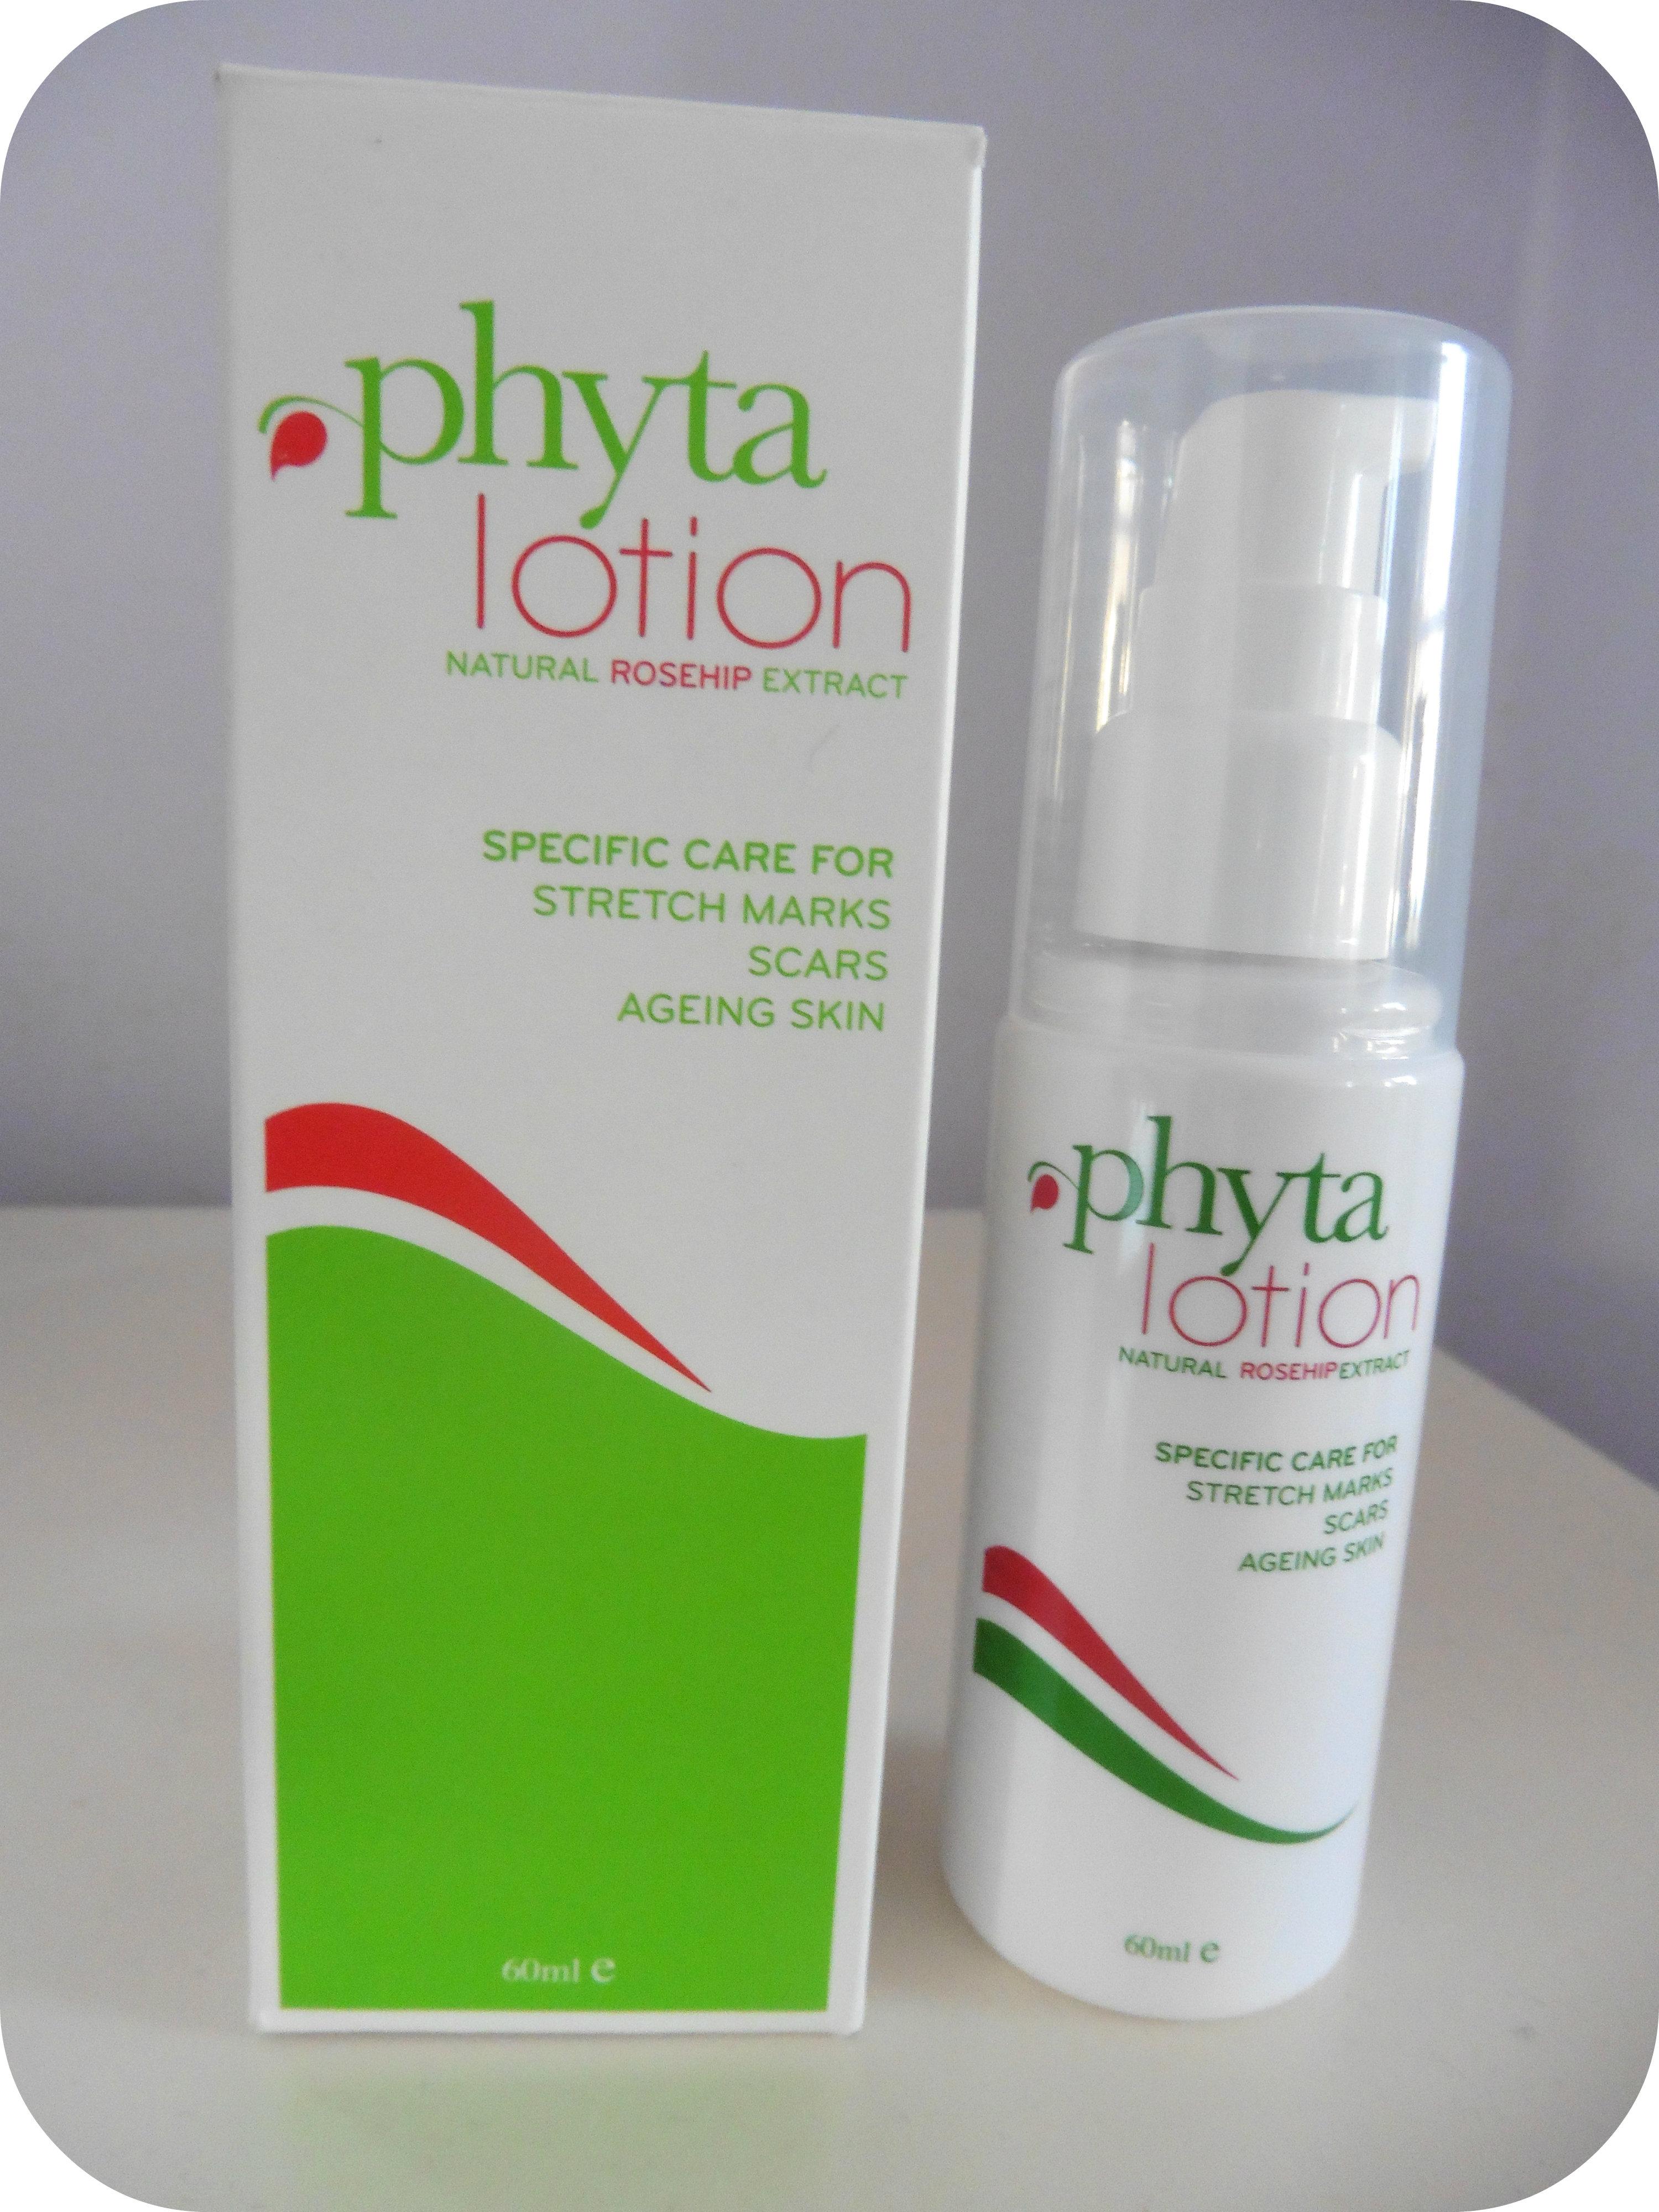 phytalotion